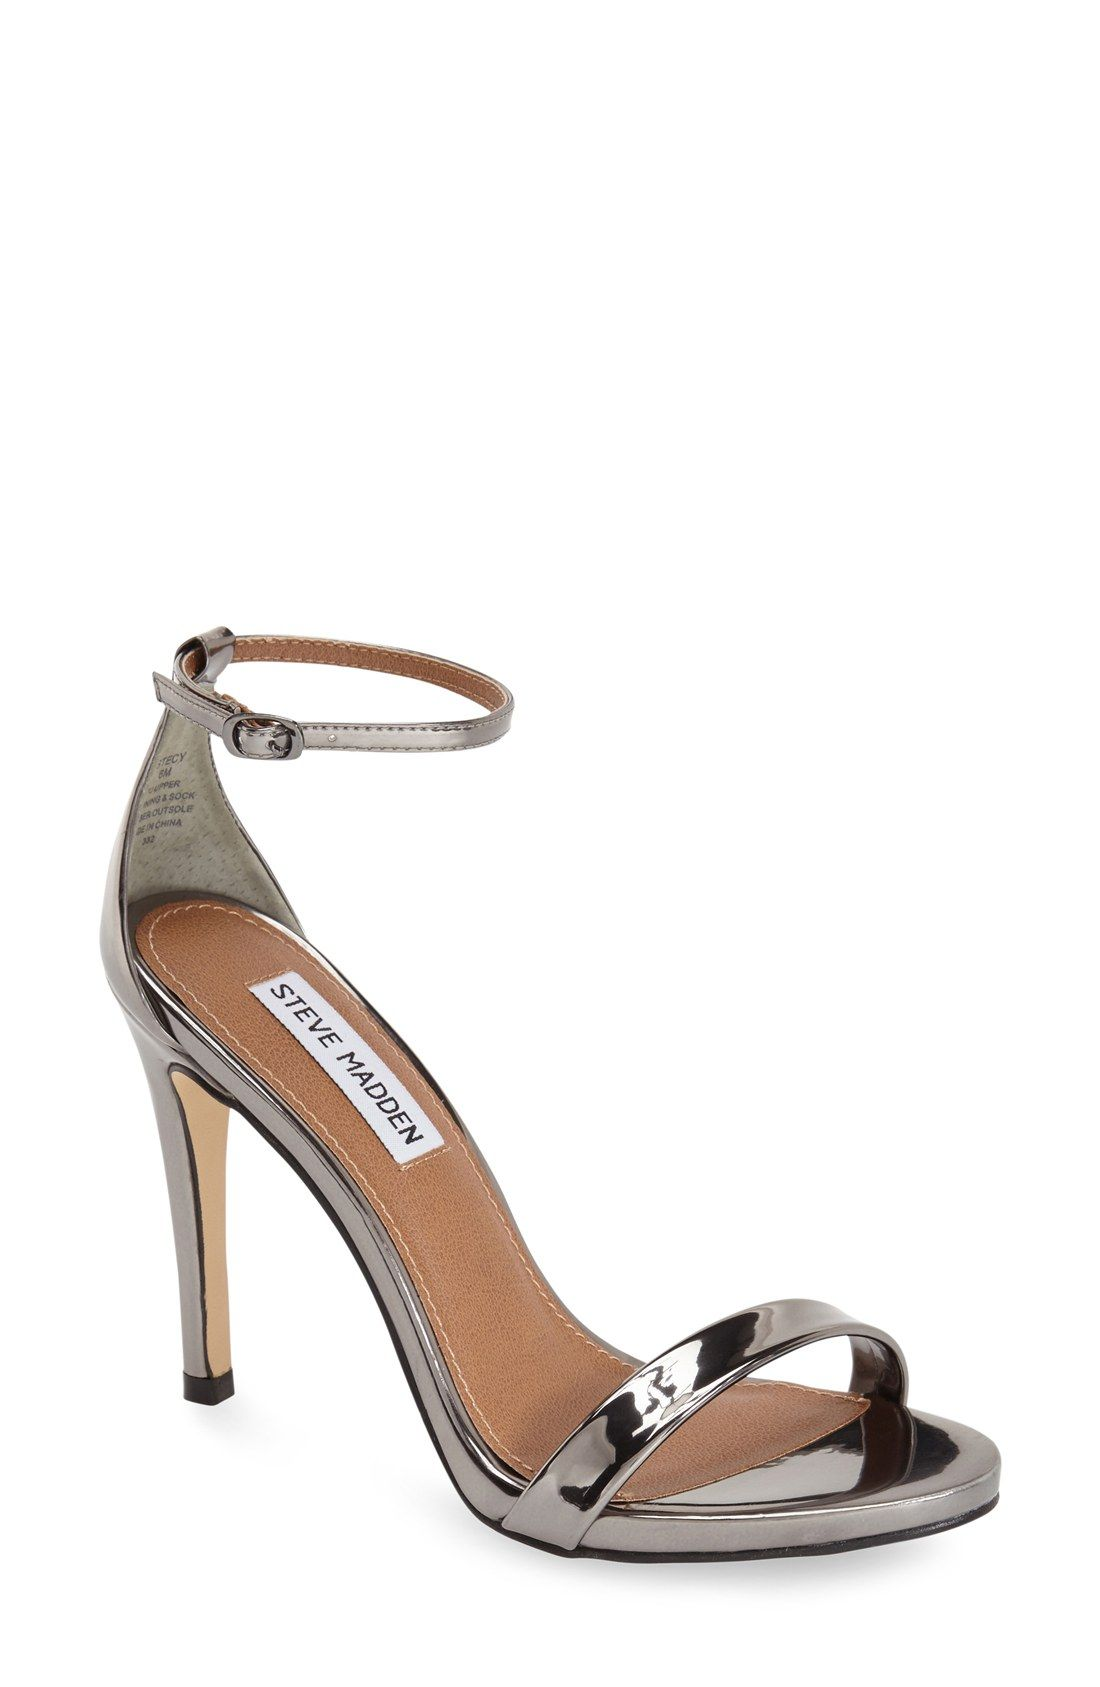 Steve Madden STECY - High heeled sandals - silver metallic 2oS6Fm2IH